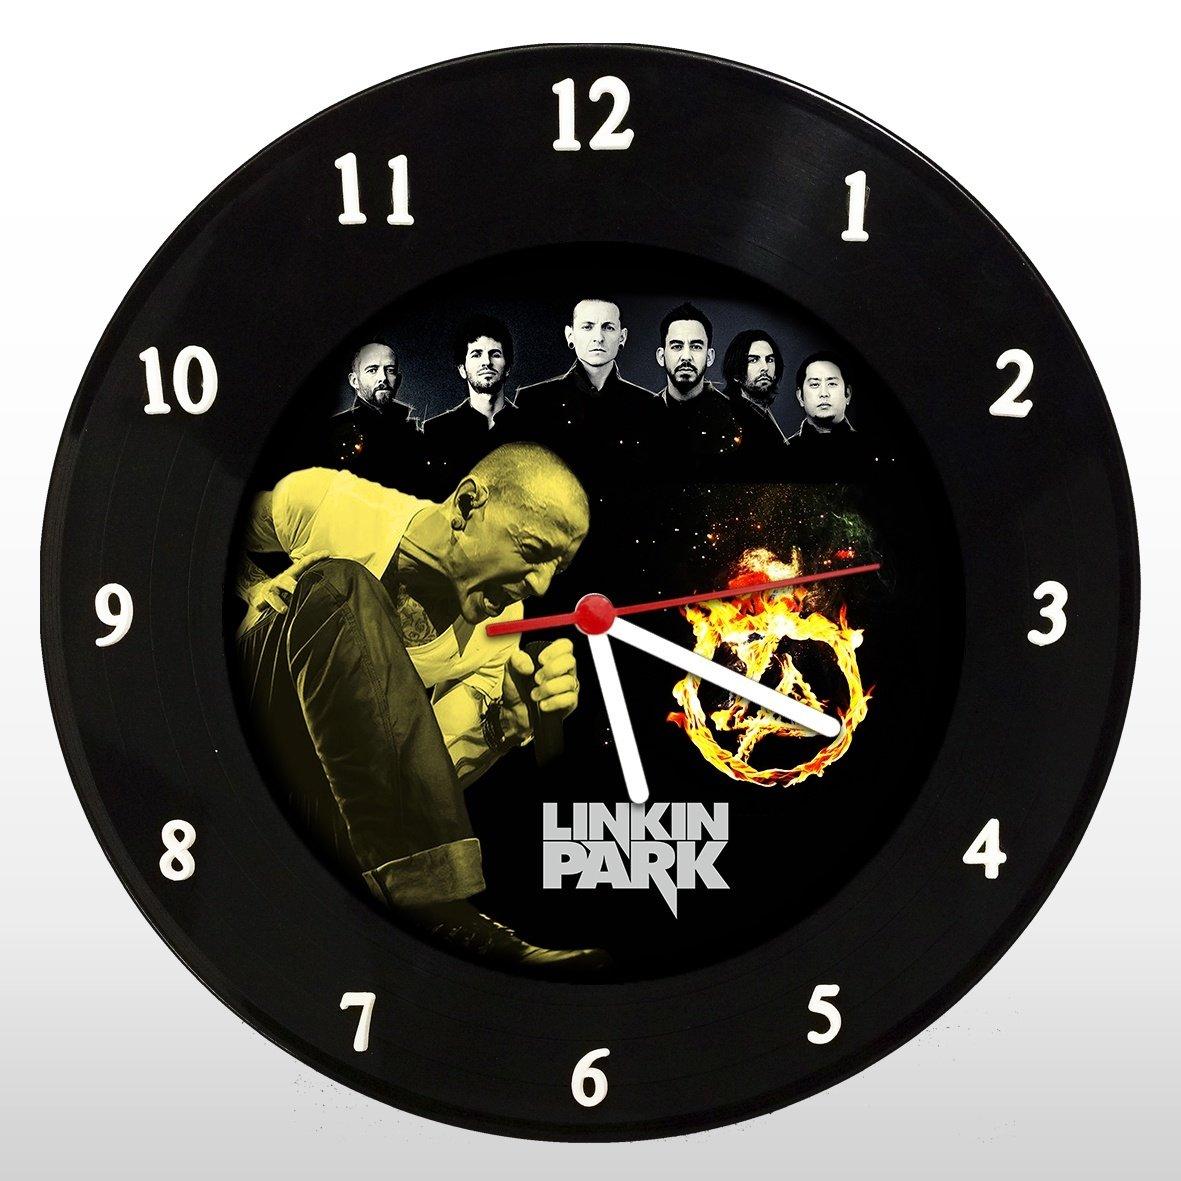 Linkin Park - Relógio de Parede em Disco de Vinil - Mr. Rock